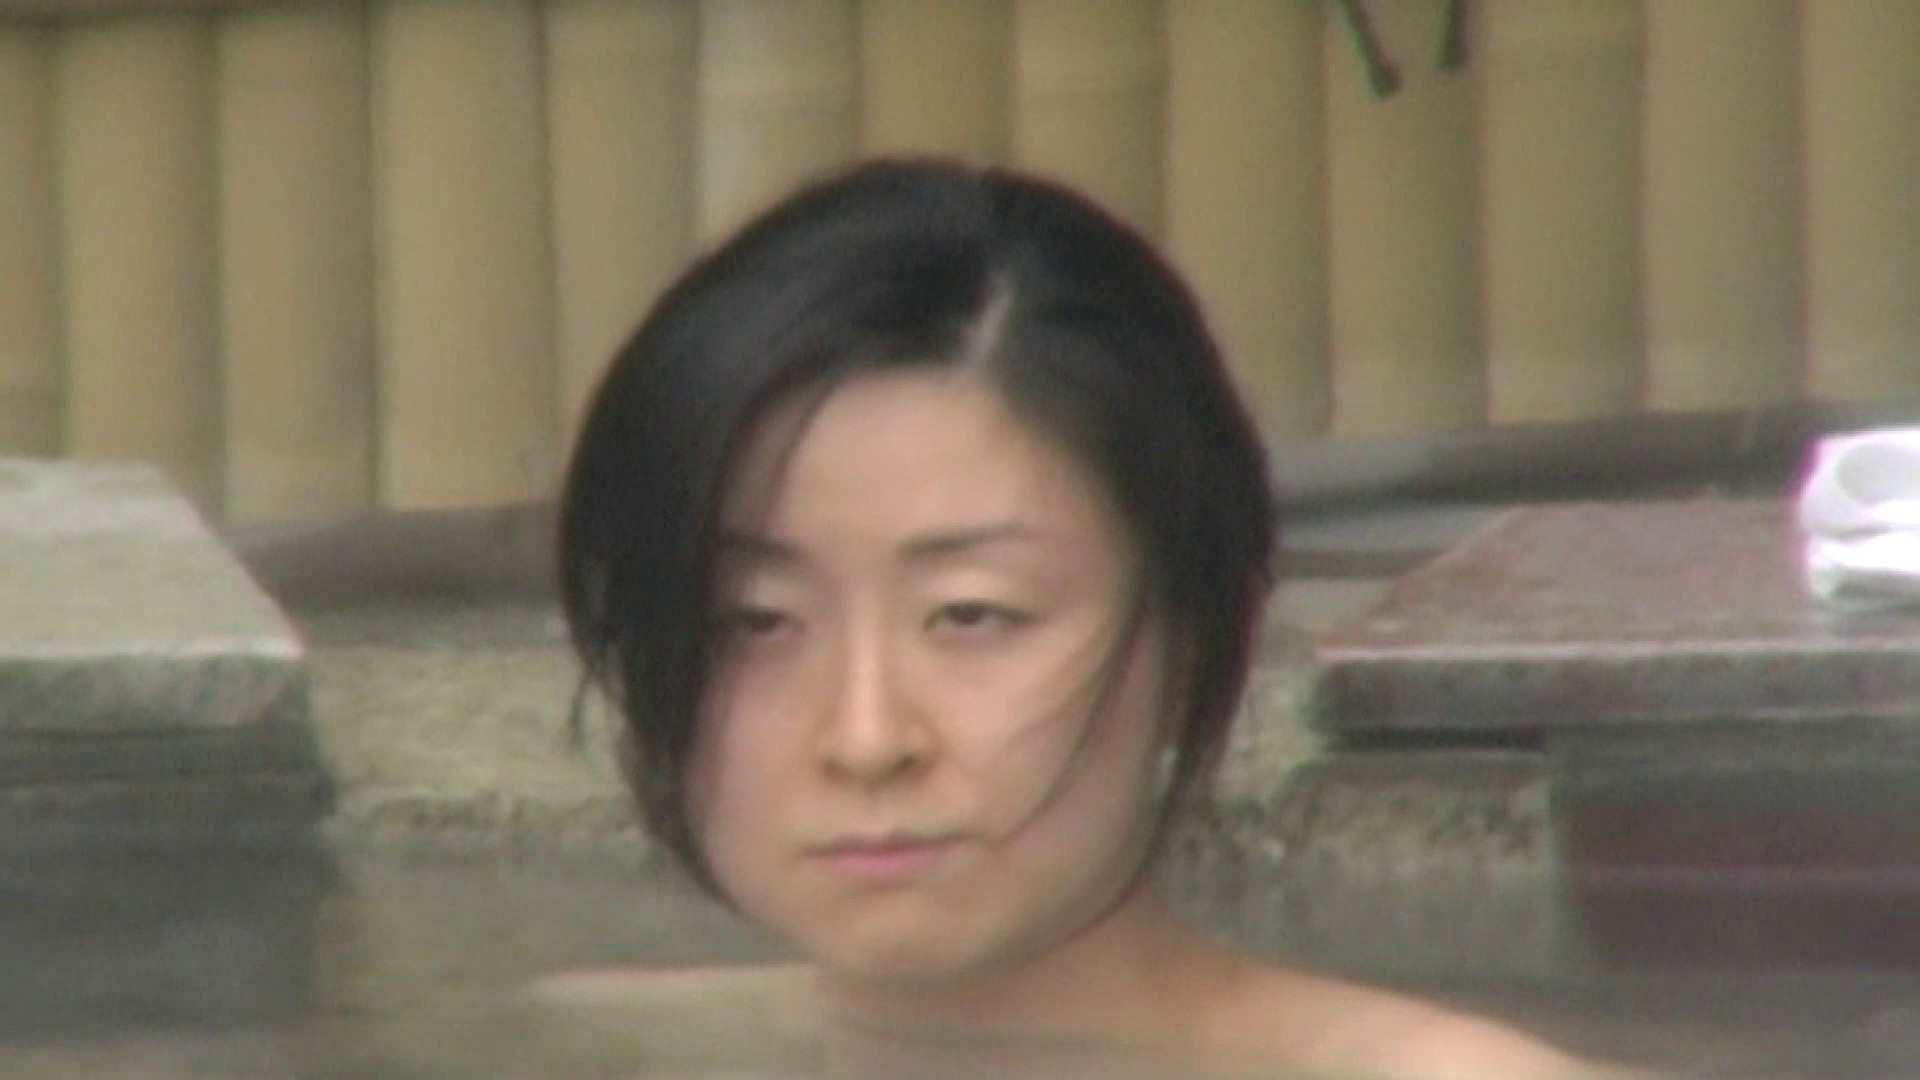 Aquaな露天風呂Vol.548 盗撮  97連発 22